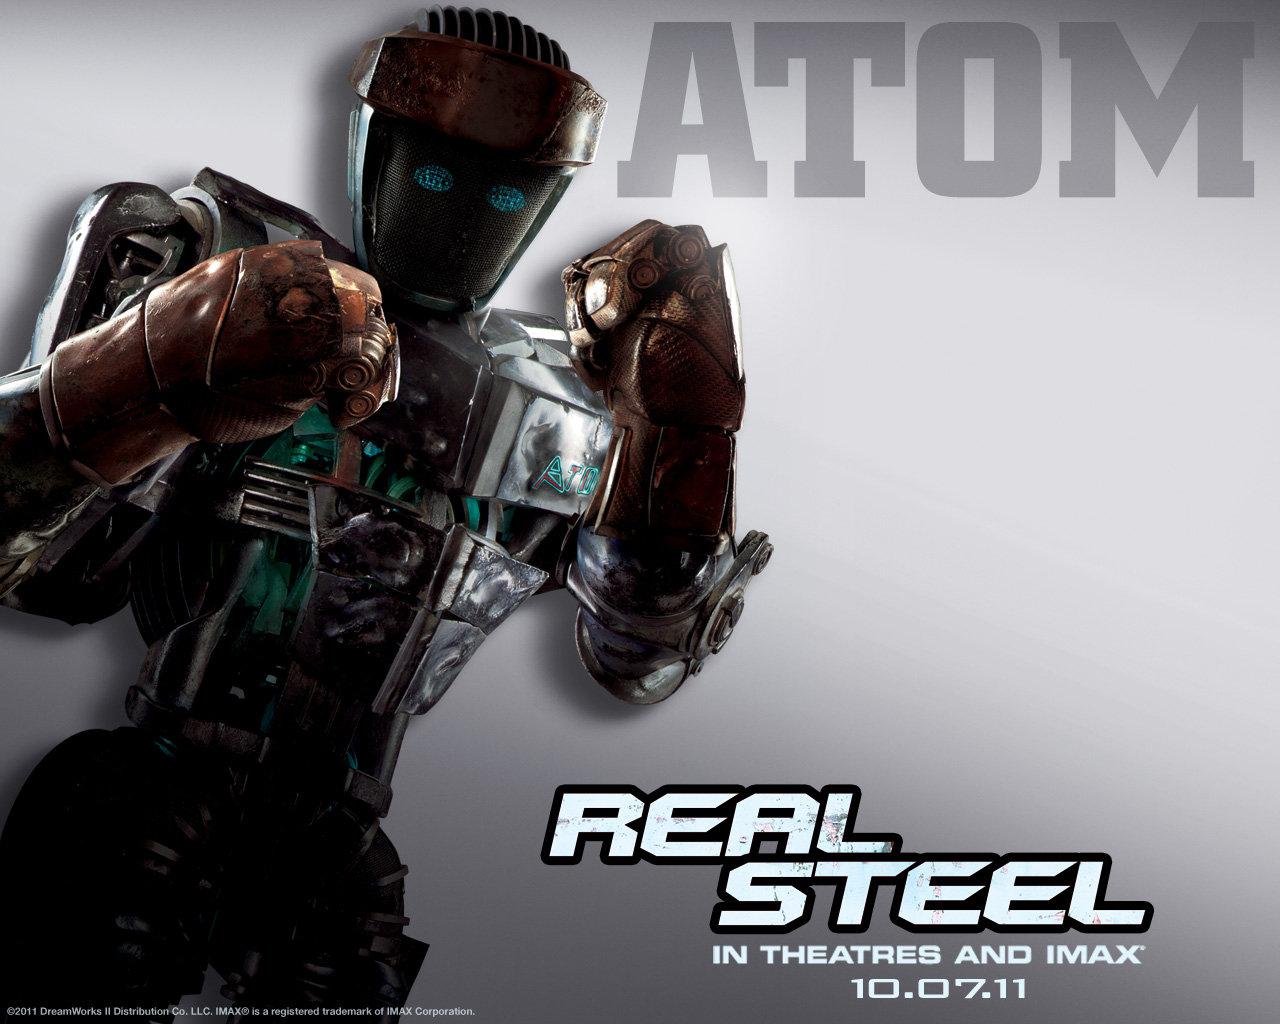 http://1.bp.blogspot.com/-bwwaVW5PjMs/TrbC-NmBQBI/AAAAAAAABIE/e7fk3305nZs/s1600/Real-Steel-Wallpaper-08.jpg